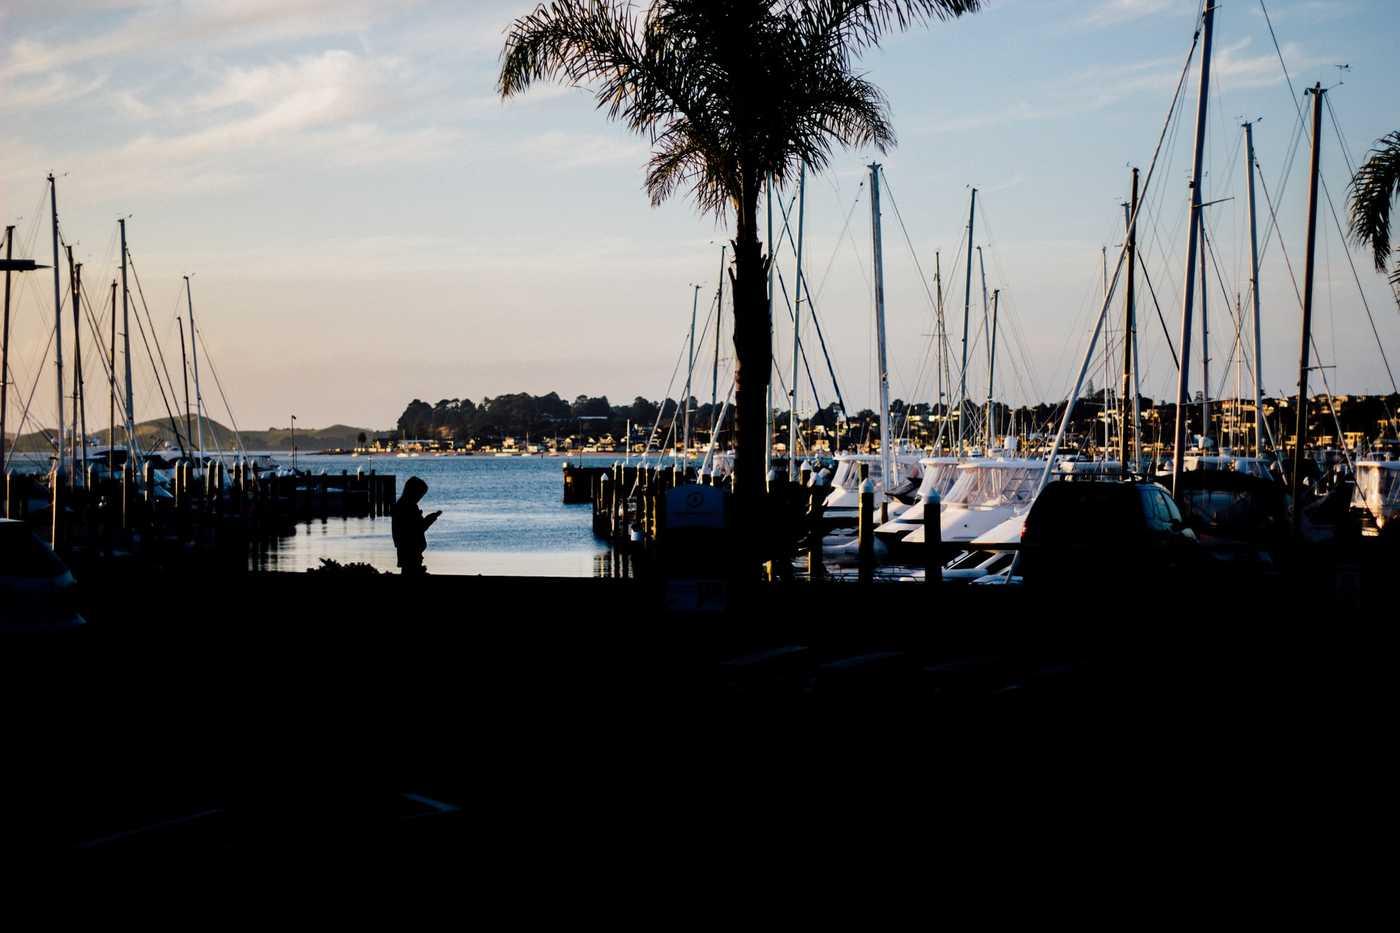 Half Moon Bay, Auckland. Photo by Tim Marshall on Unsplash